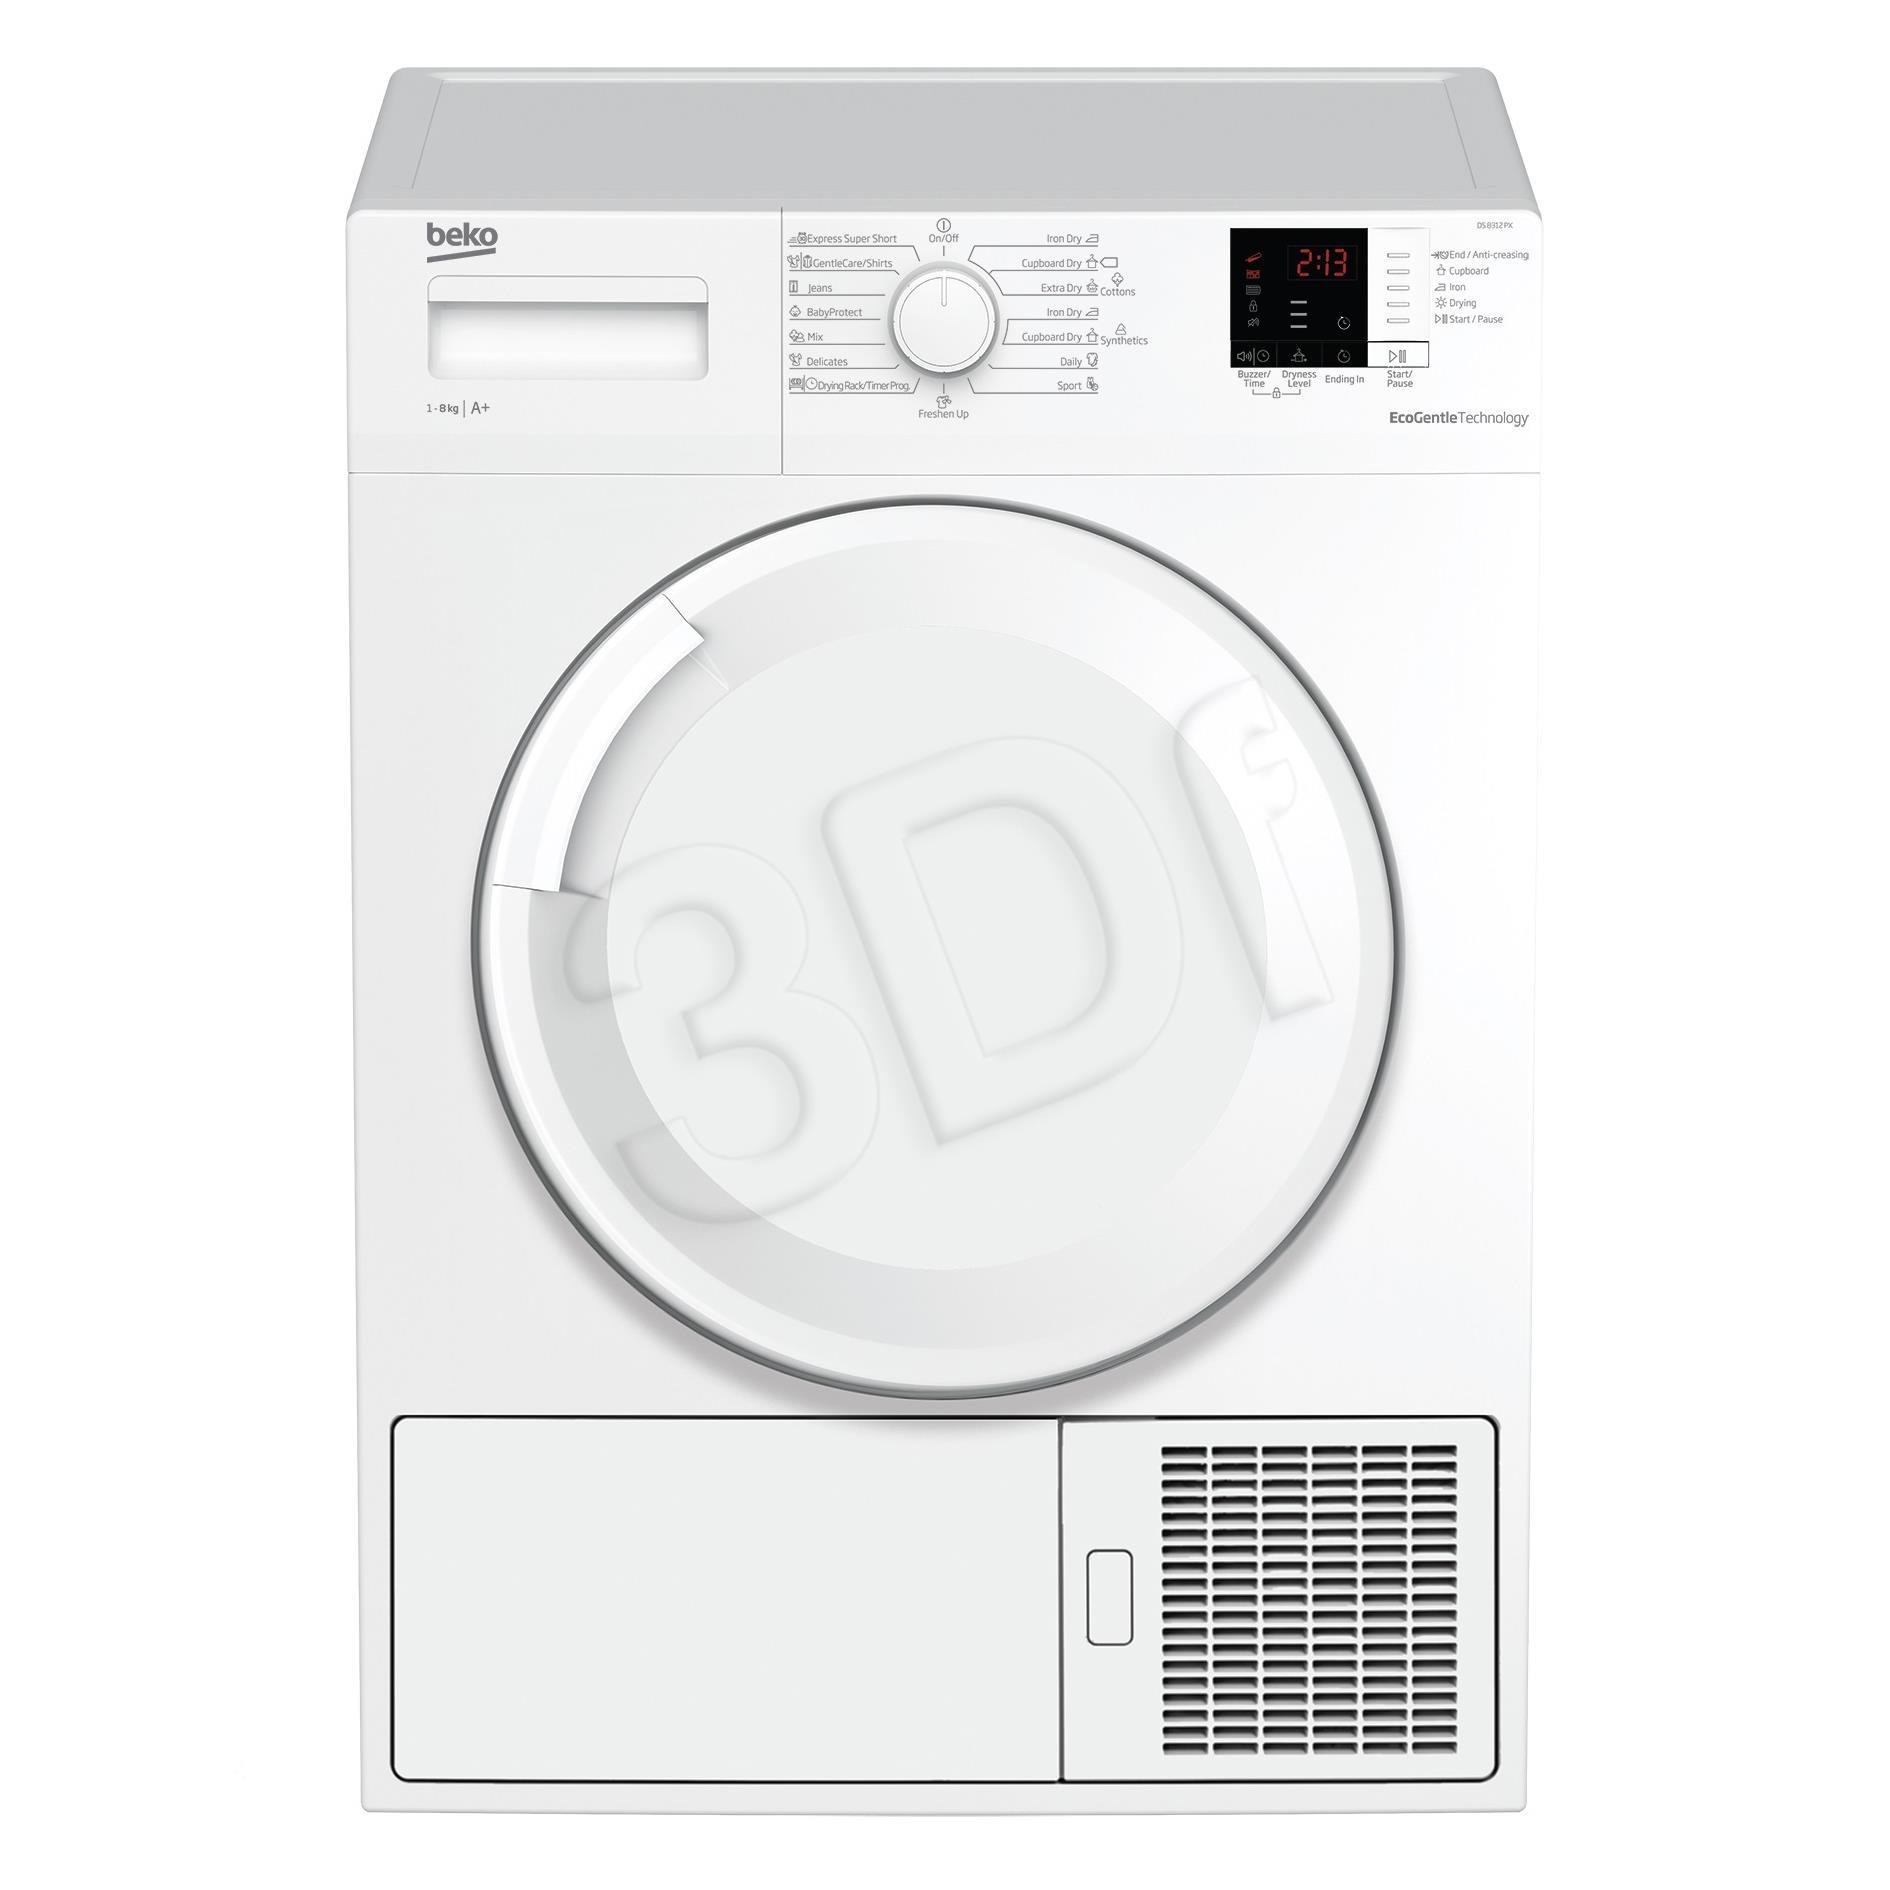 DS8312PX Dryer Veļas žāvētājs